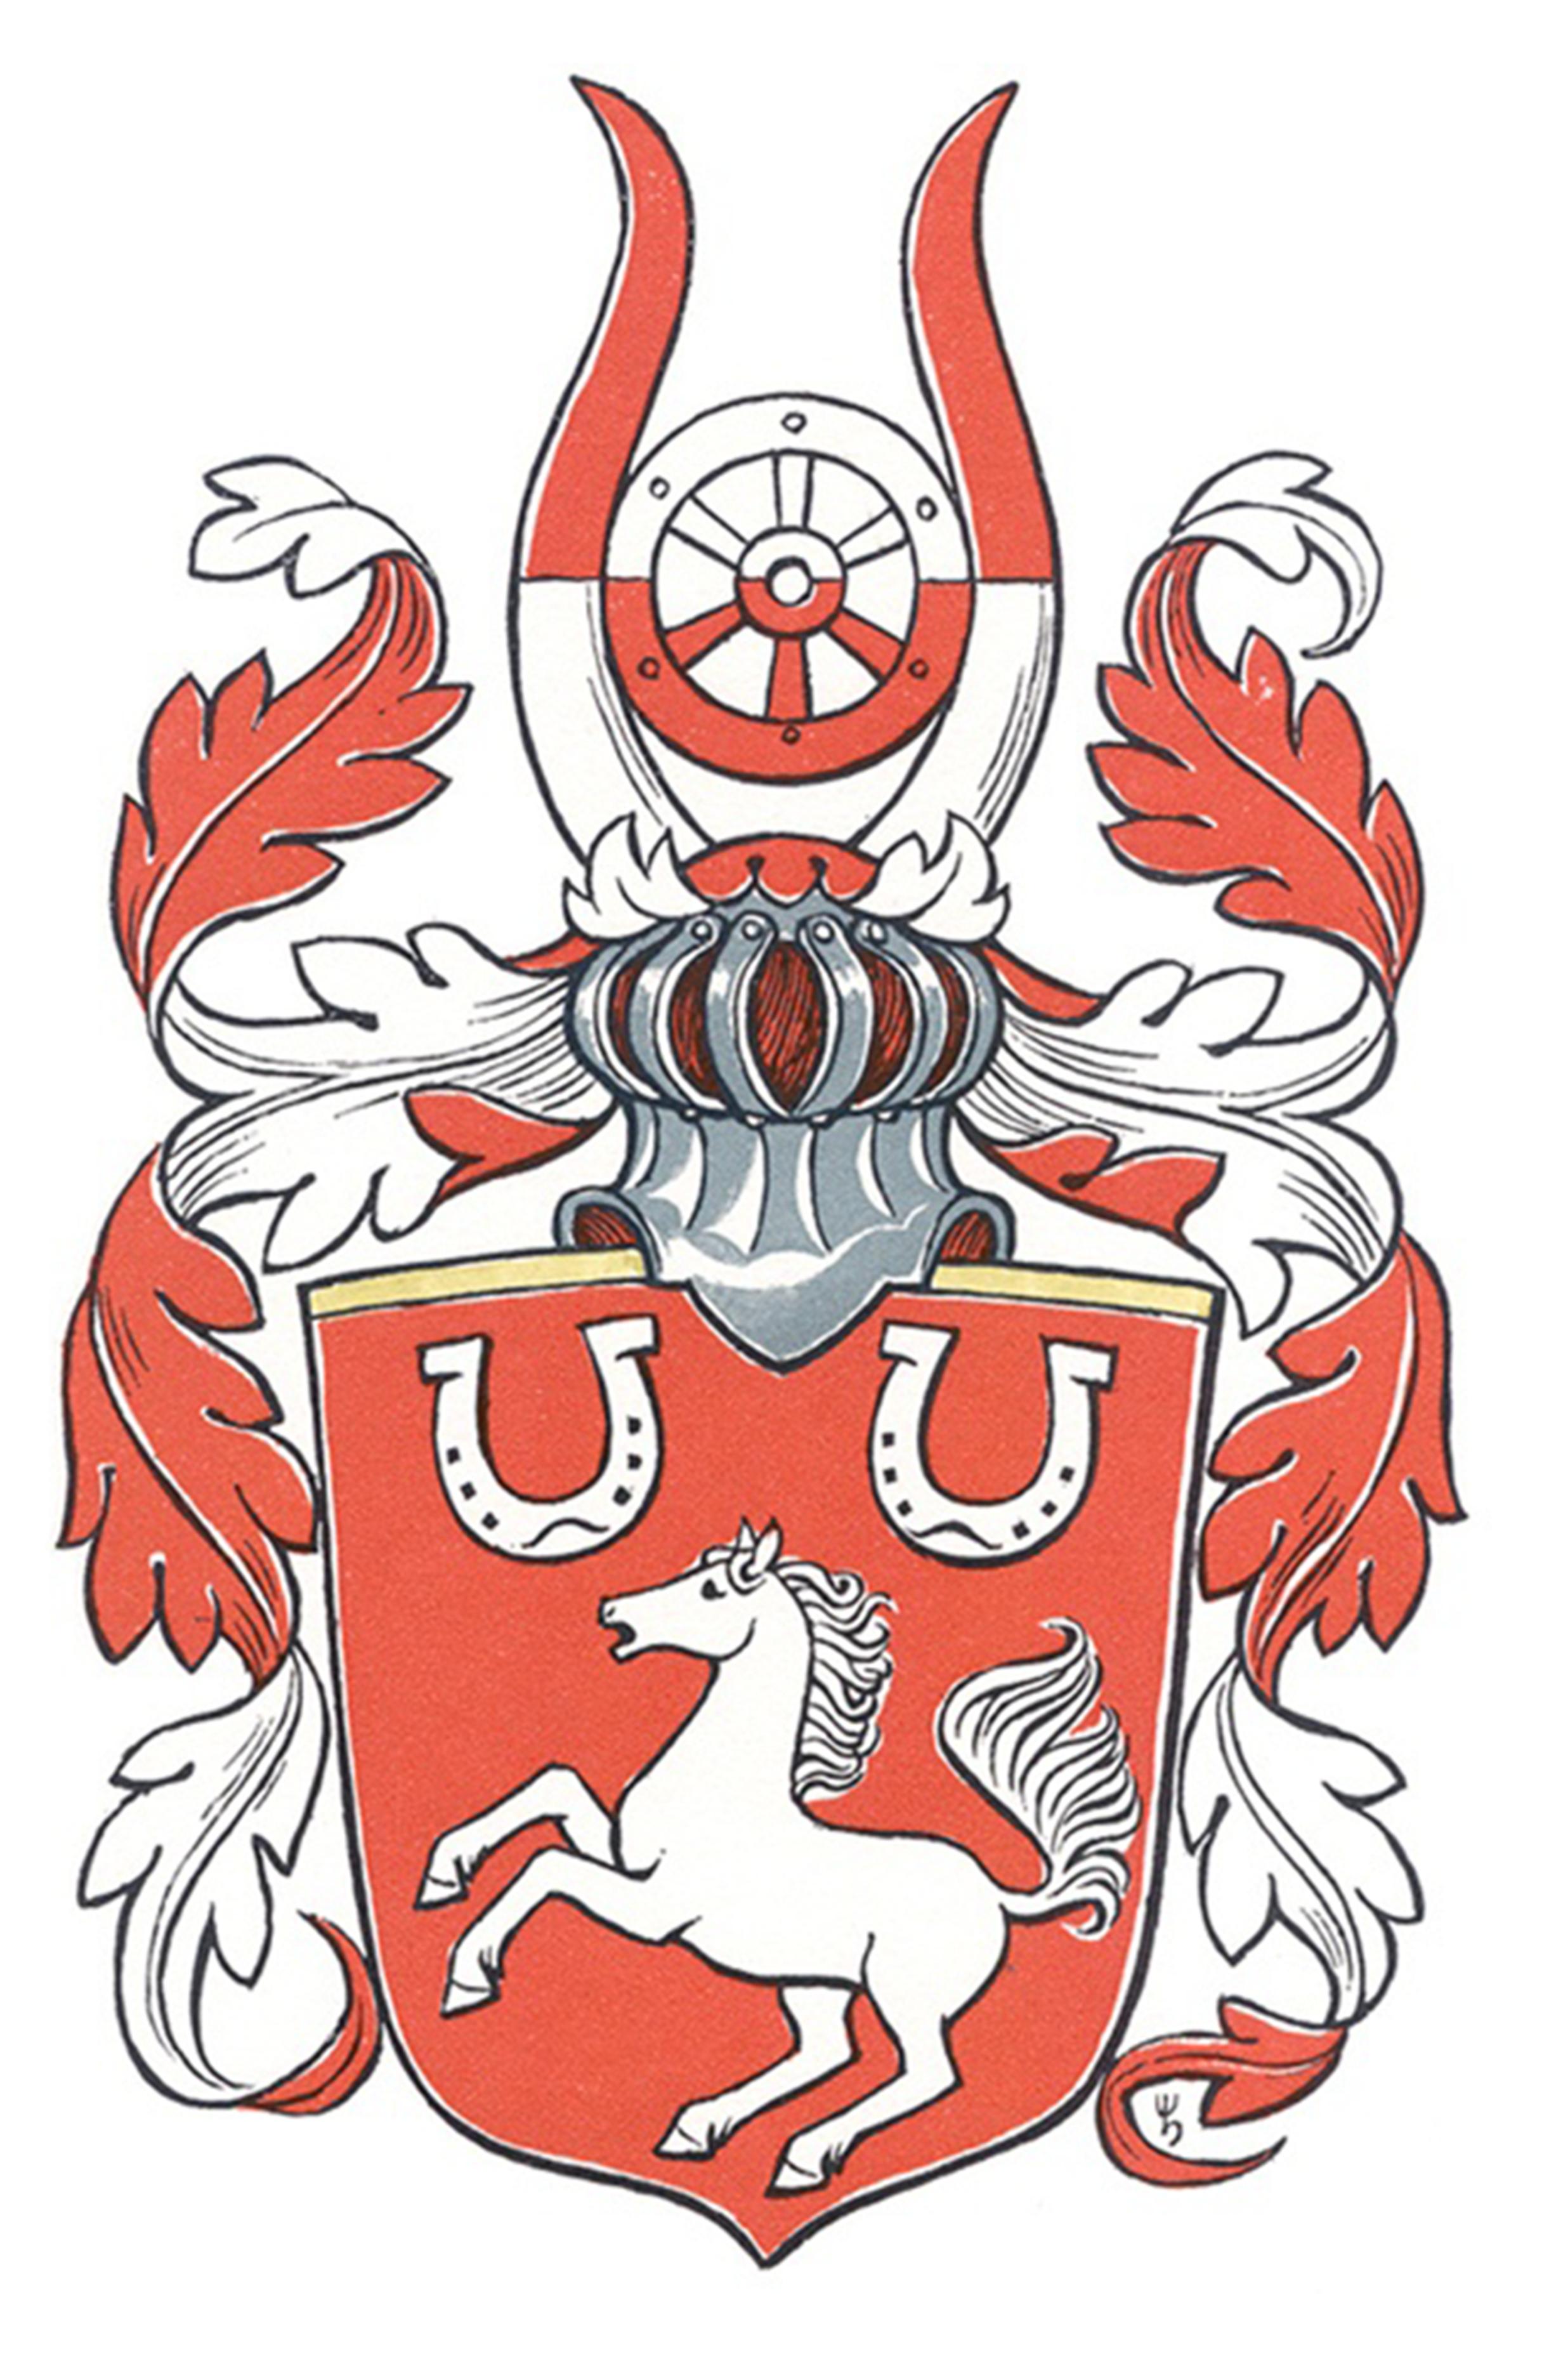 Linsenhoff